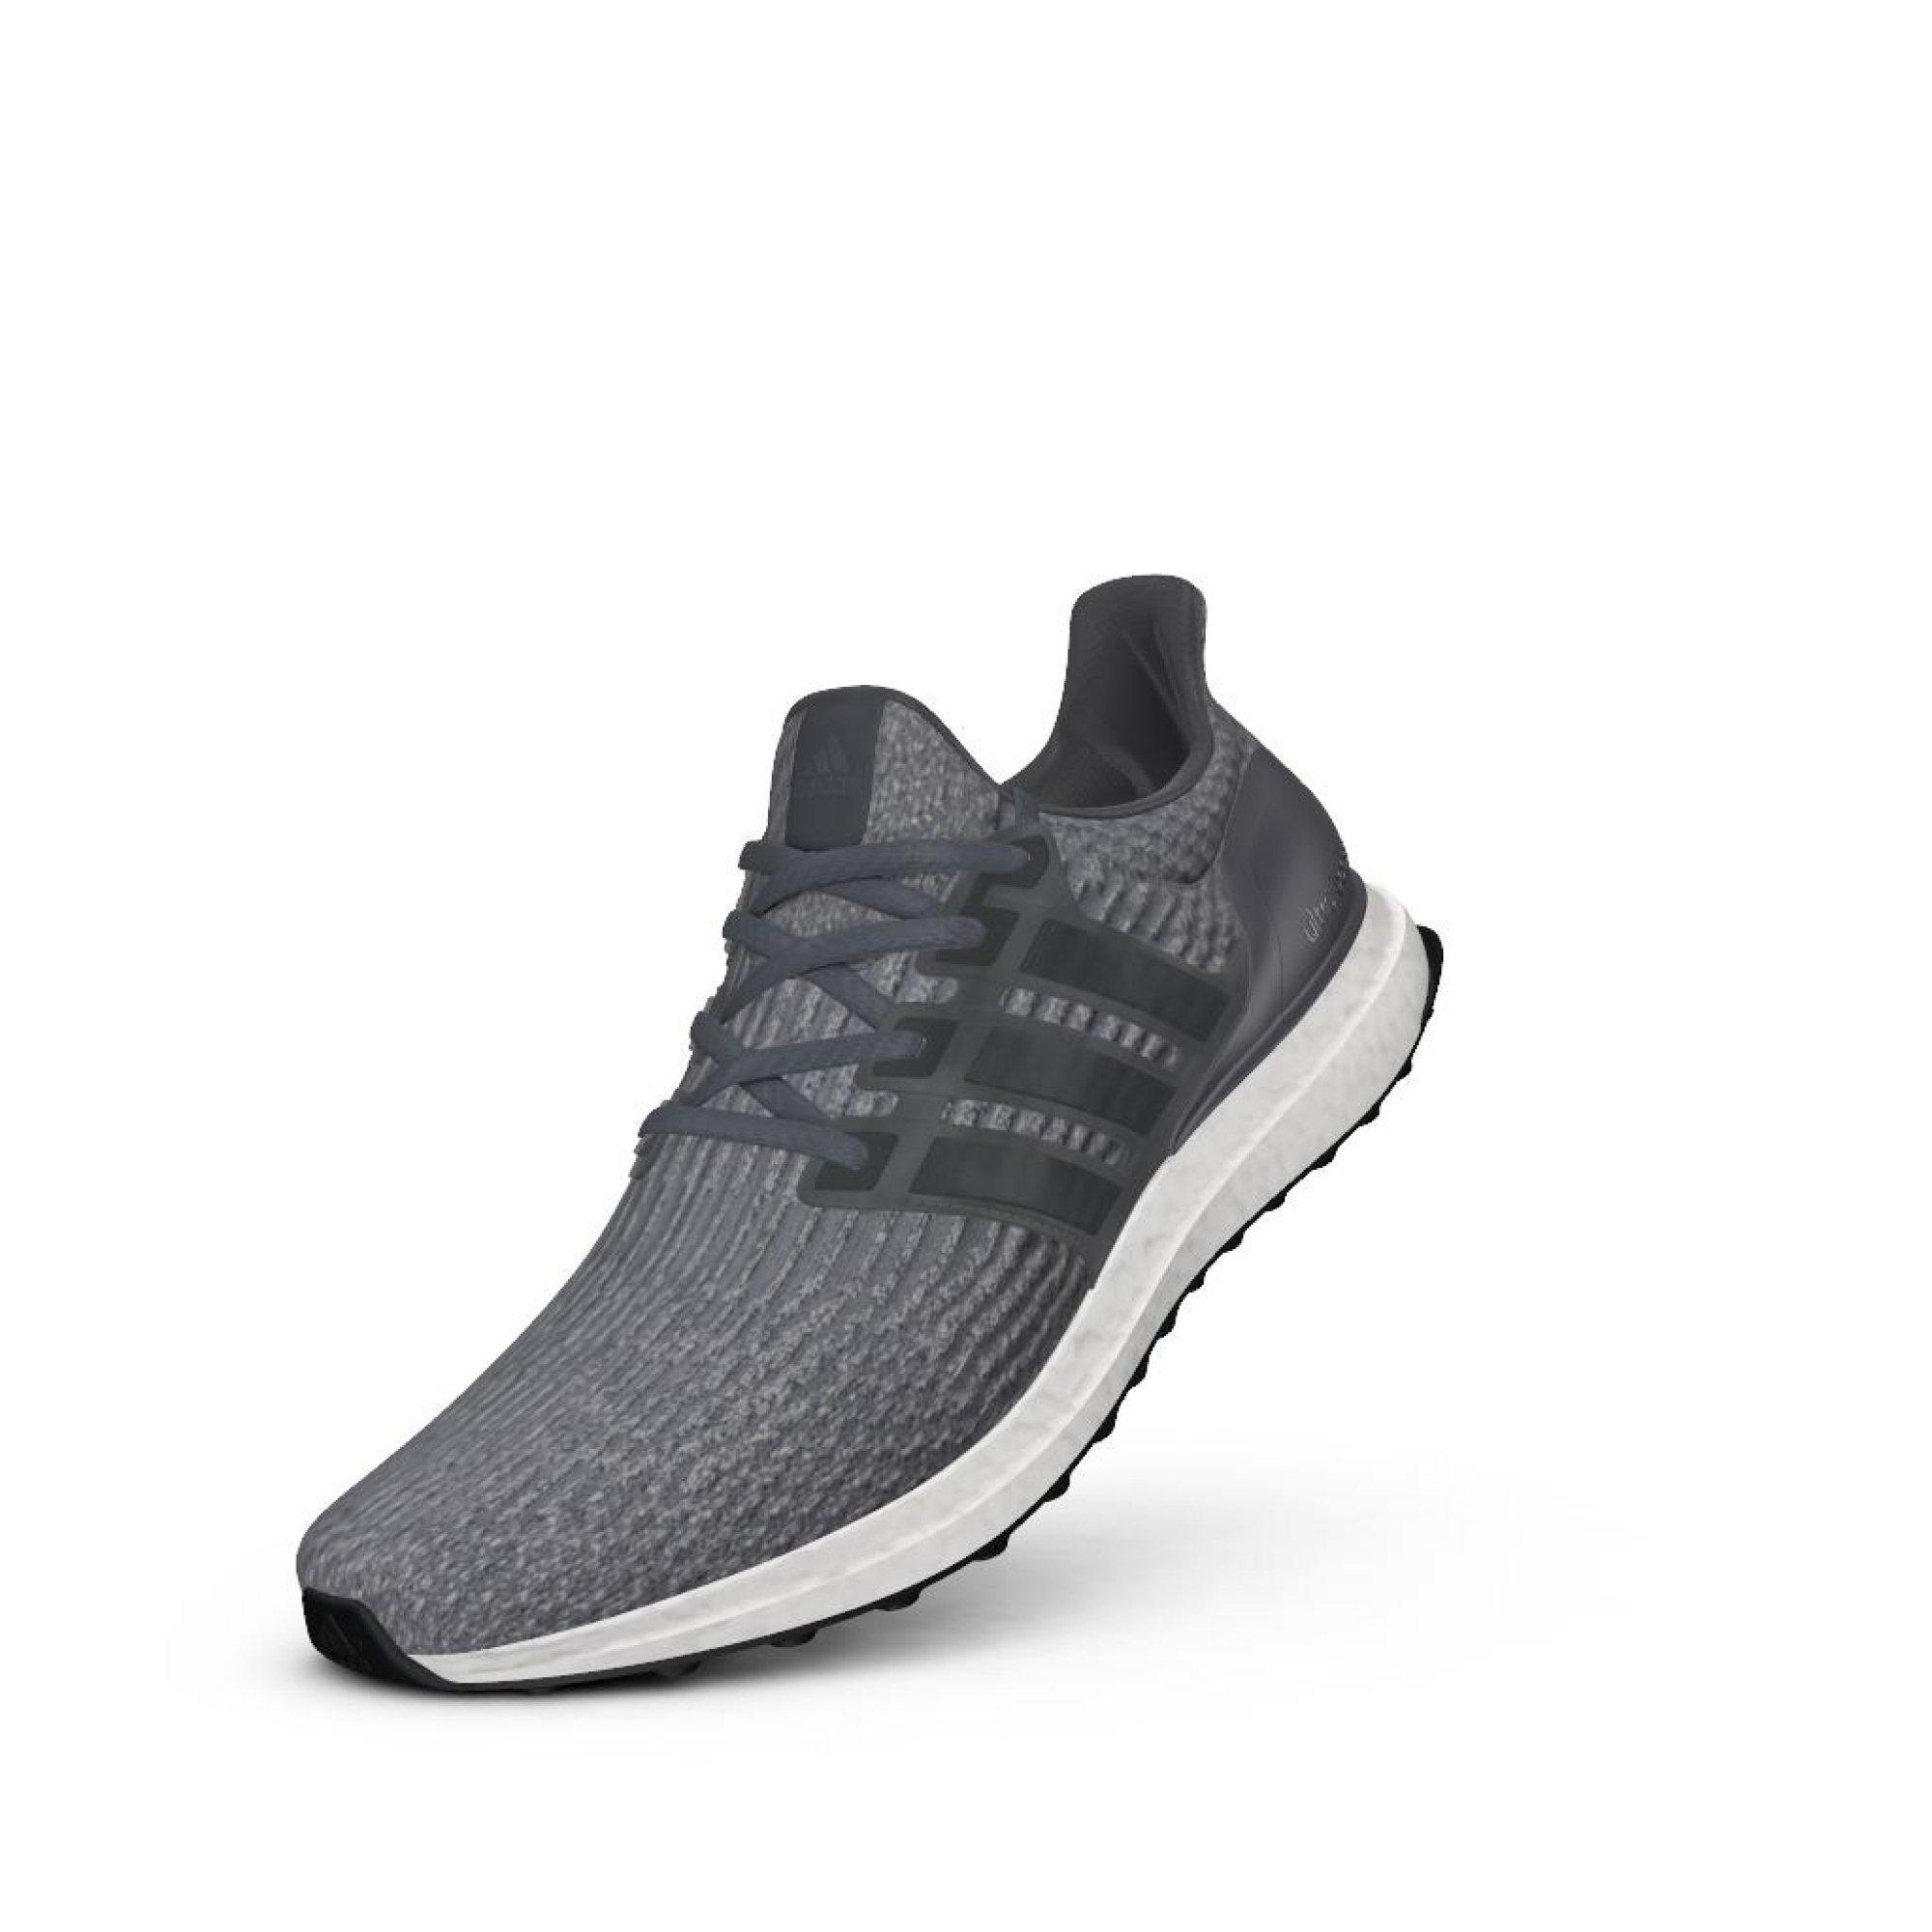 ... adidas Ultra Boost 3.0 Women\u0027s Running Shoe - Main Container Image ...